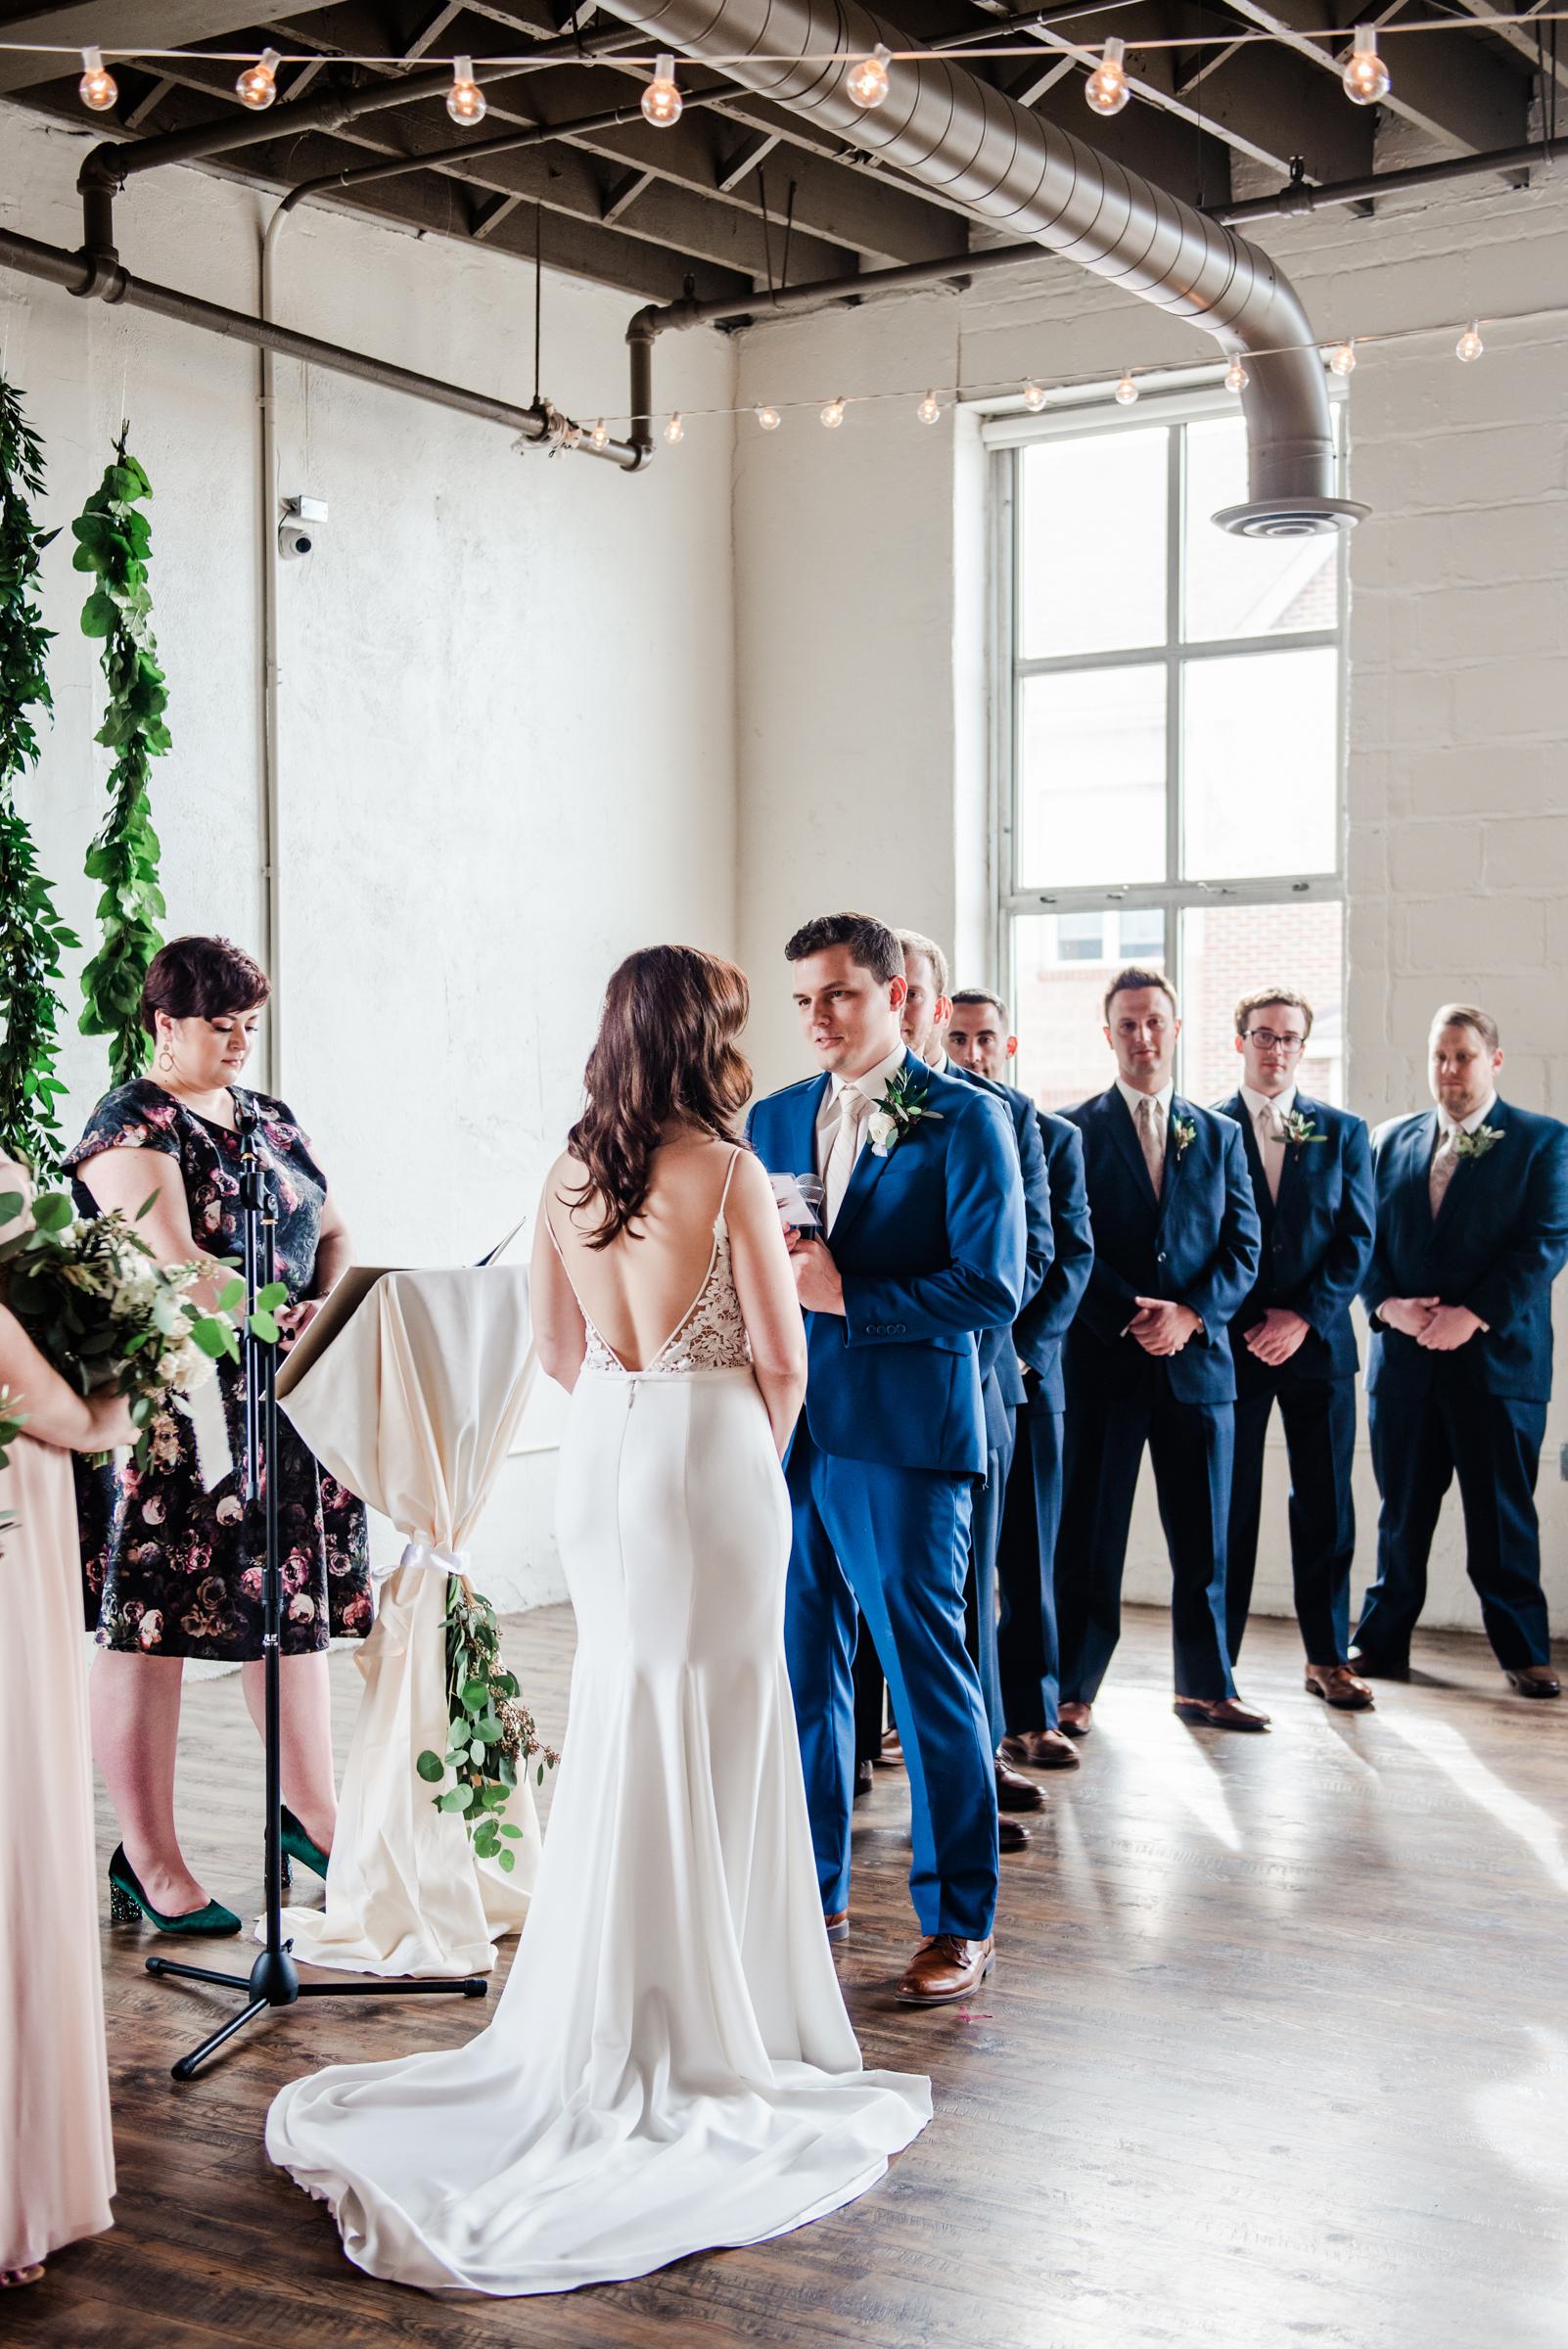 The_Arbor_LoftRochester_Wedding_JILL_STUDIO_Rochester_NY_Photographer_171206.jpg